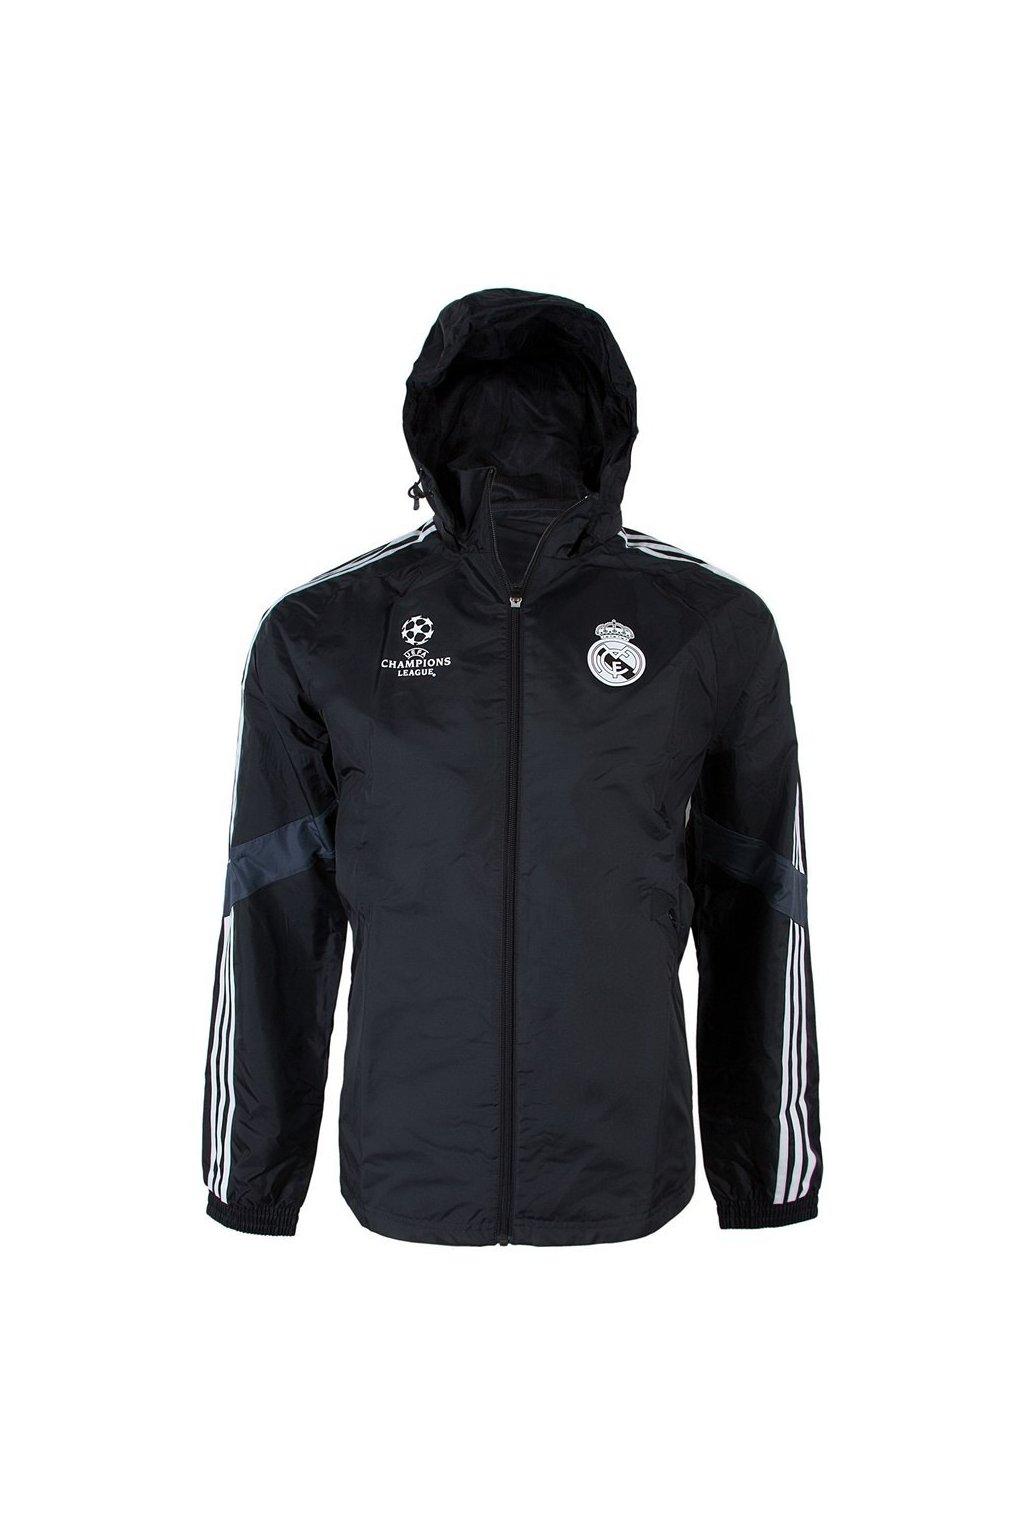 0122a1b1a4abb ADIDAS REAL MADRID pánska prechodná bunda - Fresh sport